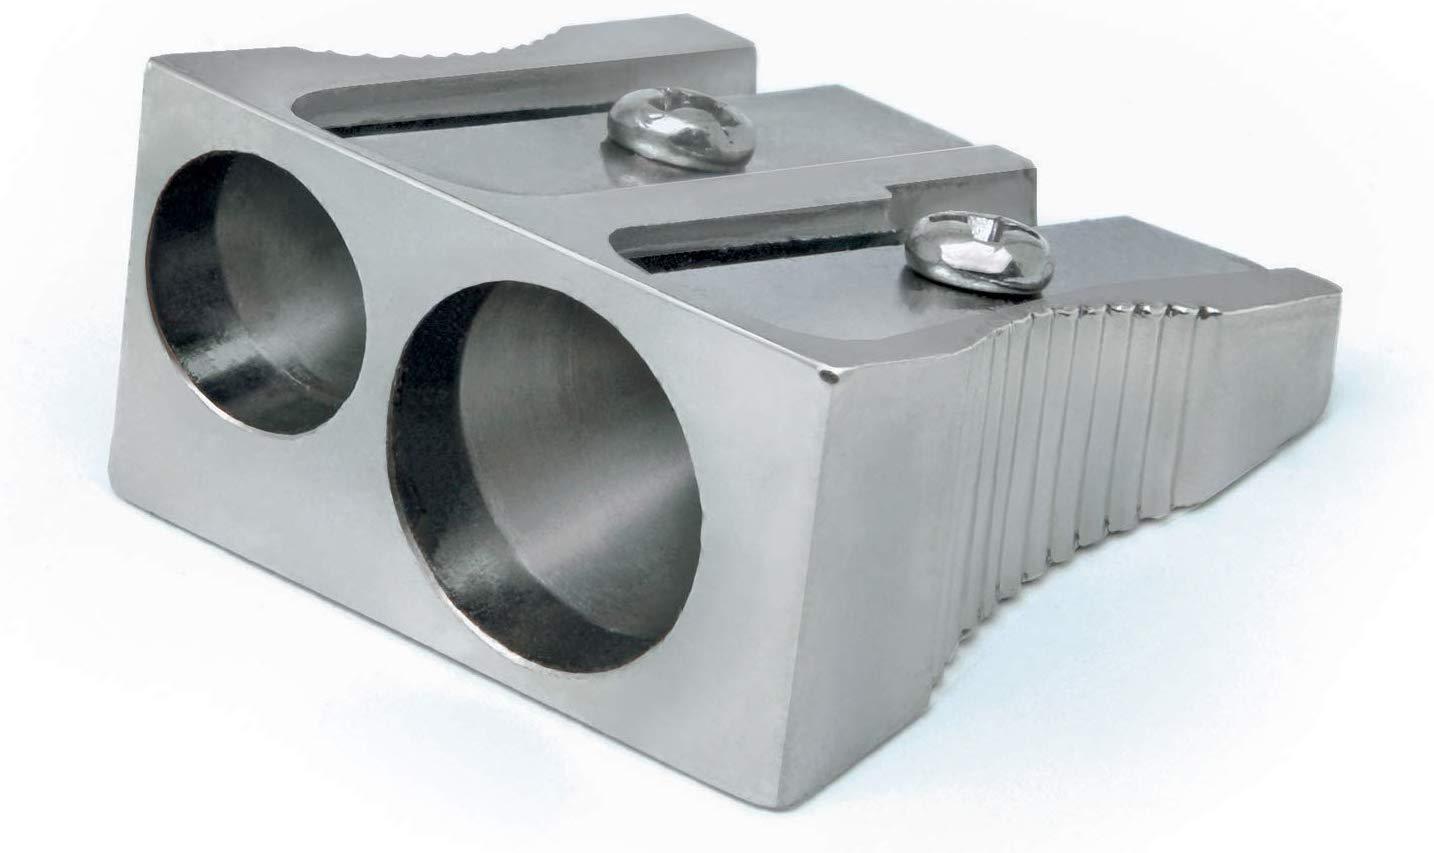 Rapesco R14DCDM2 Pencil Sharpener - Traditional Double Hole Sharpener- Grey